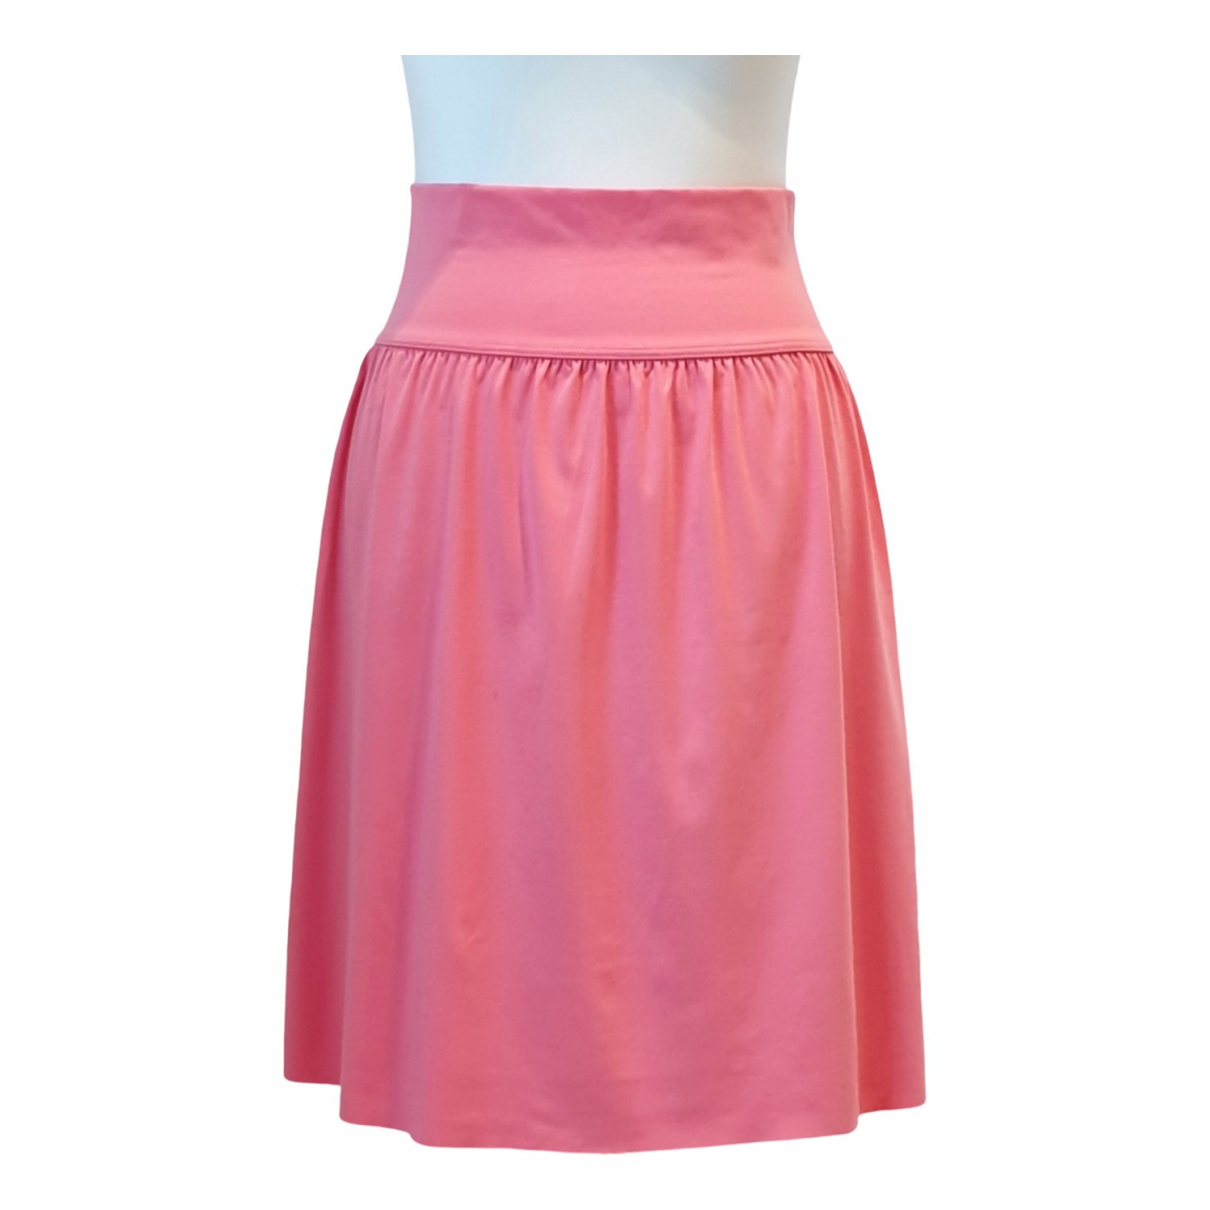 Wolford \N Pink skirt for Women S International